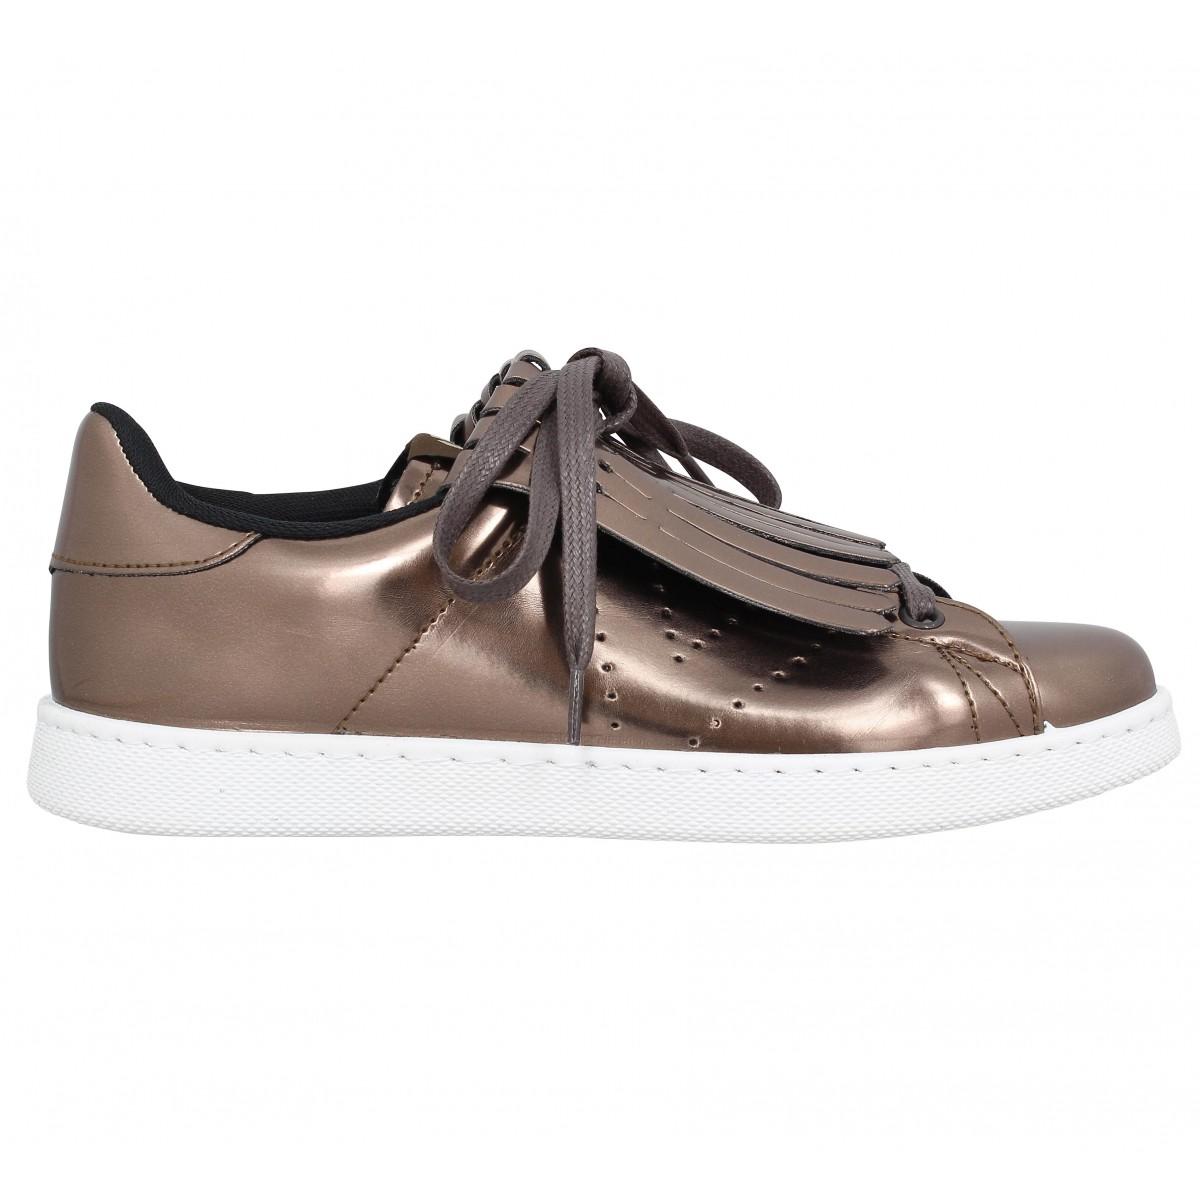 Chaussures bronze femme bdh9ip3